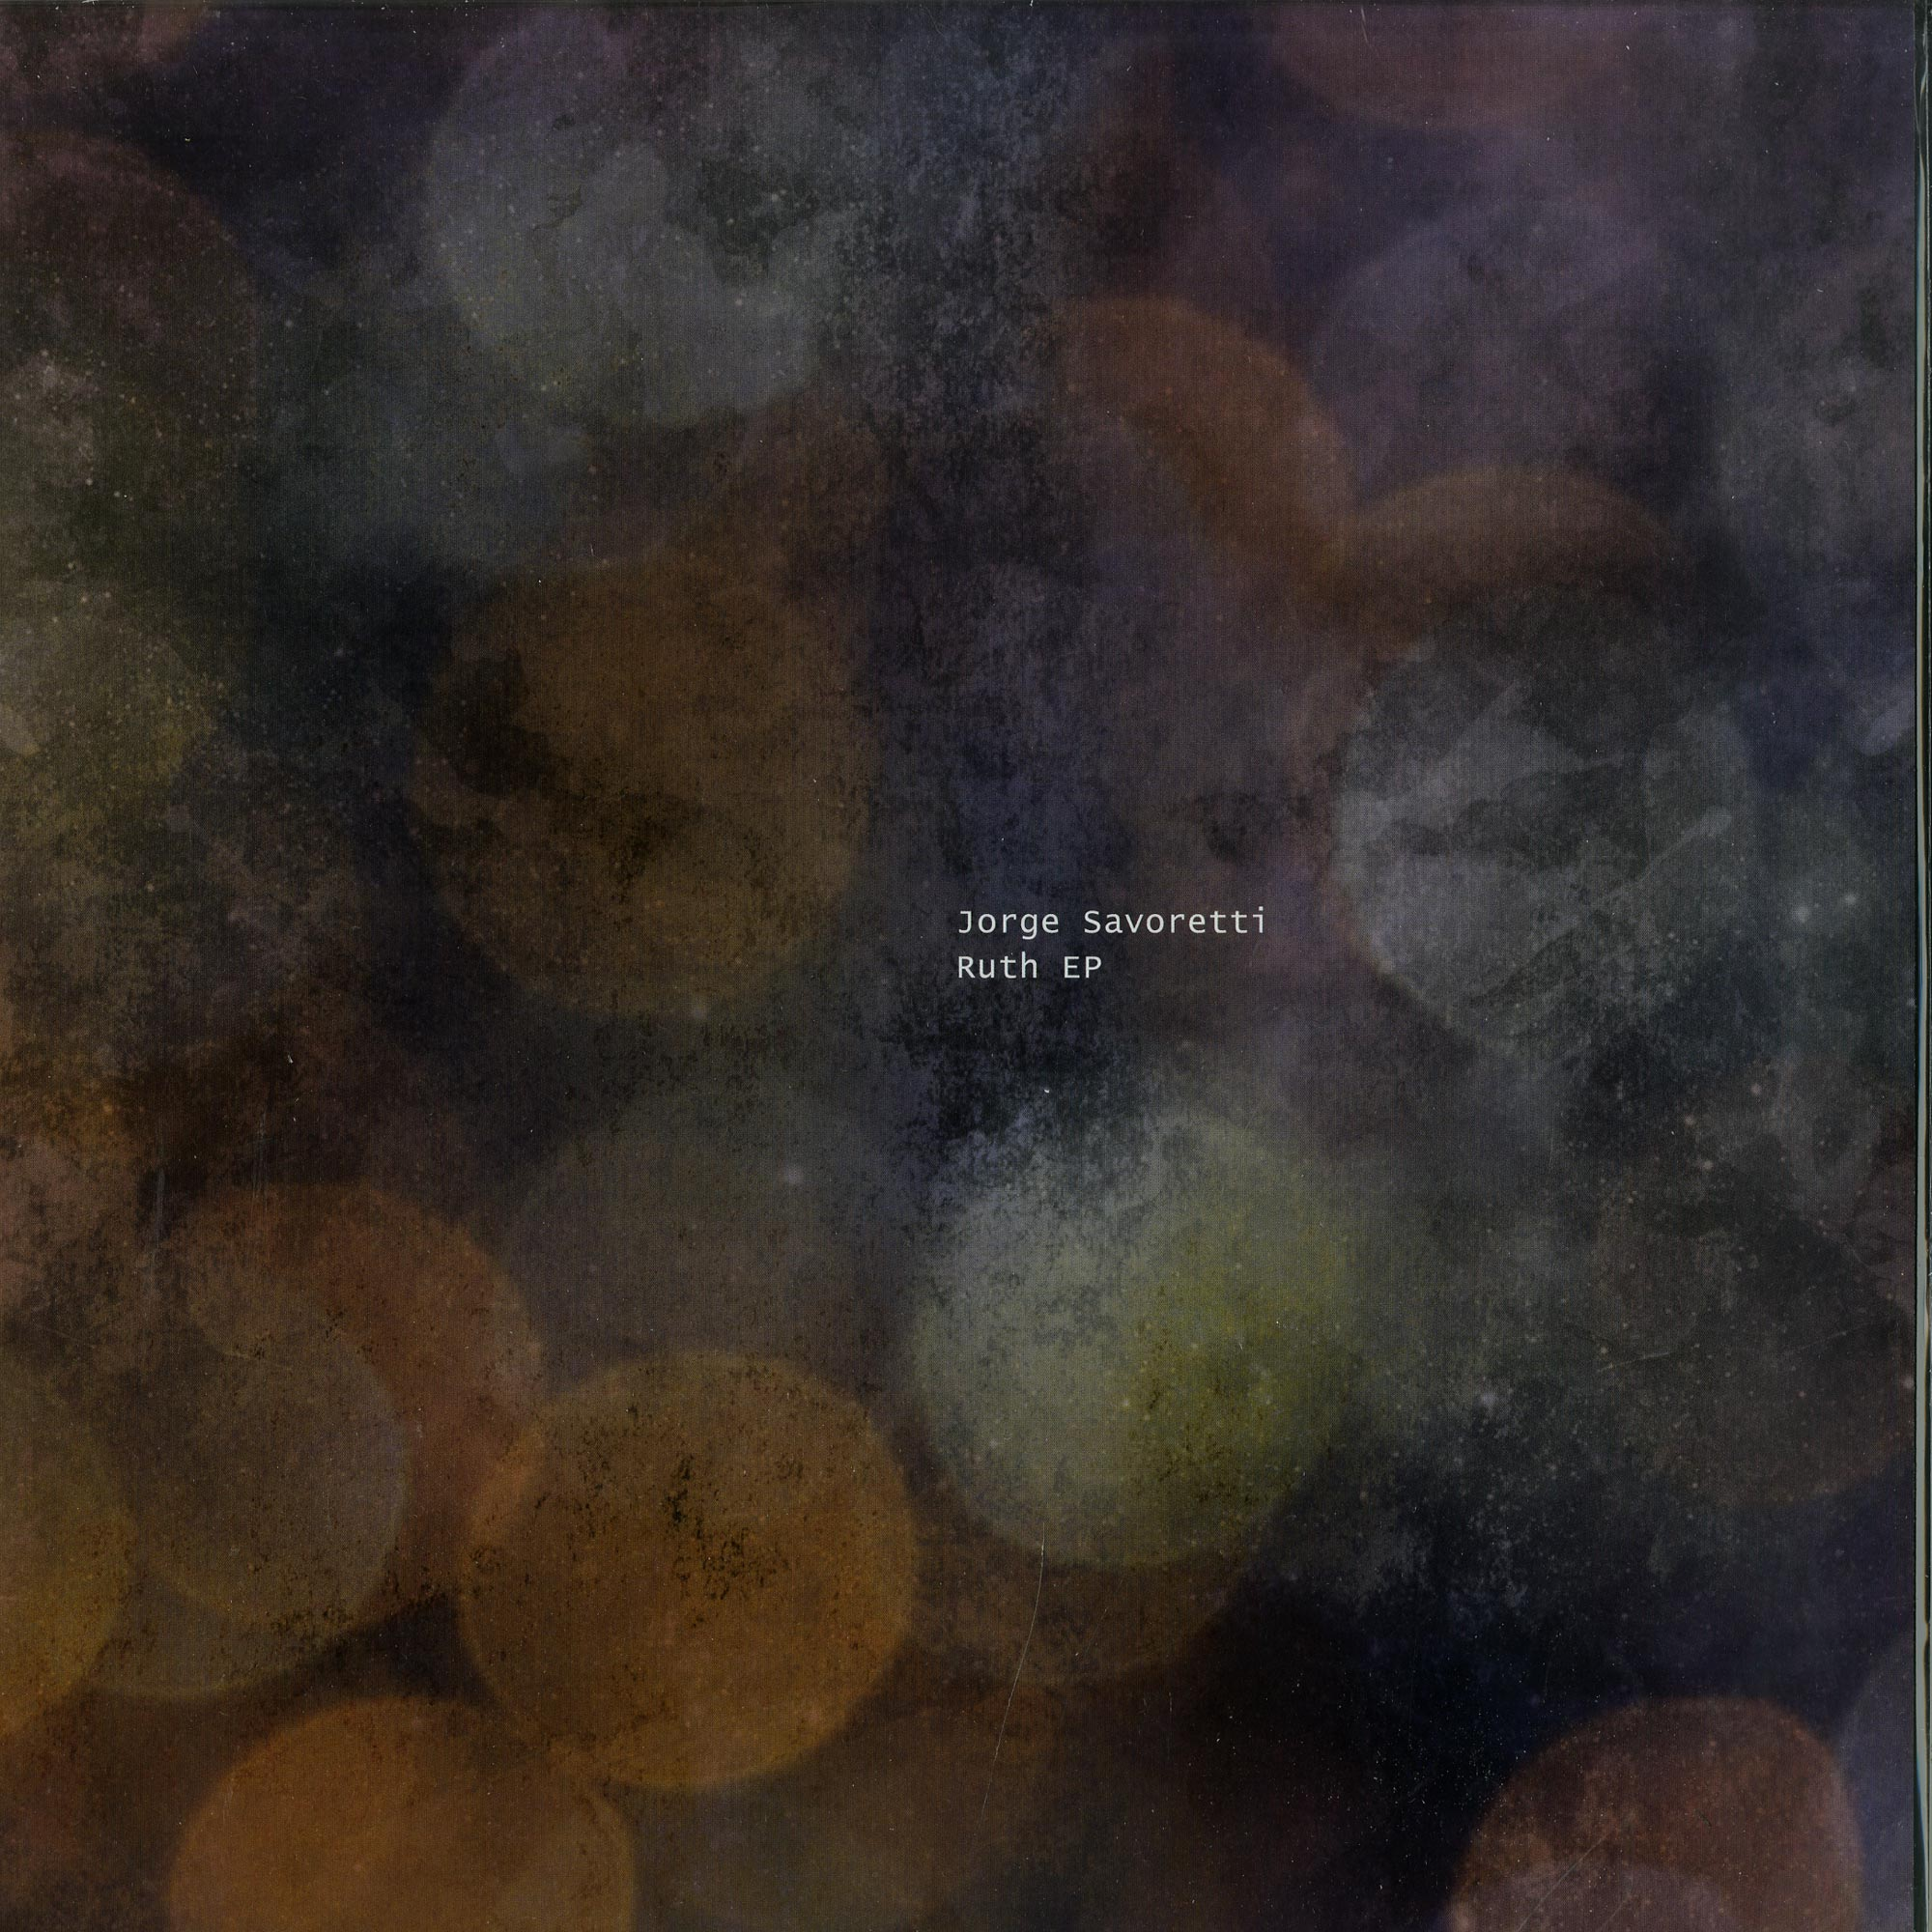 Jorge Savoretti - RUTH EP